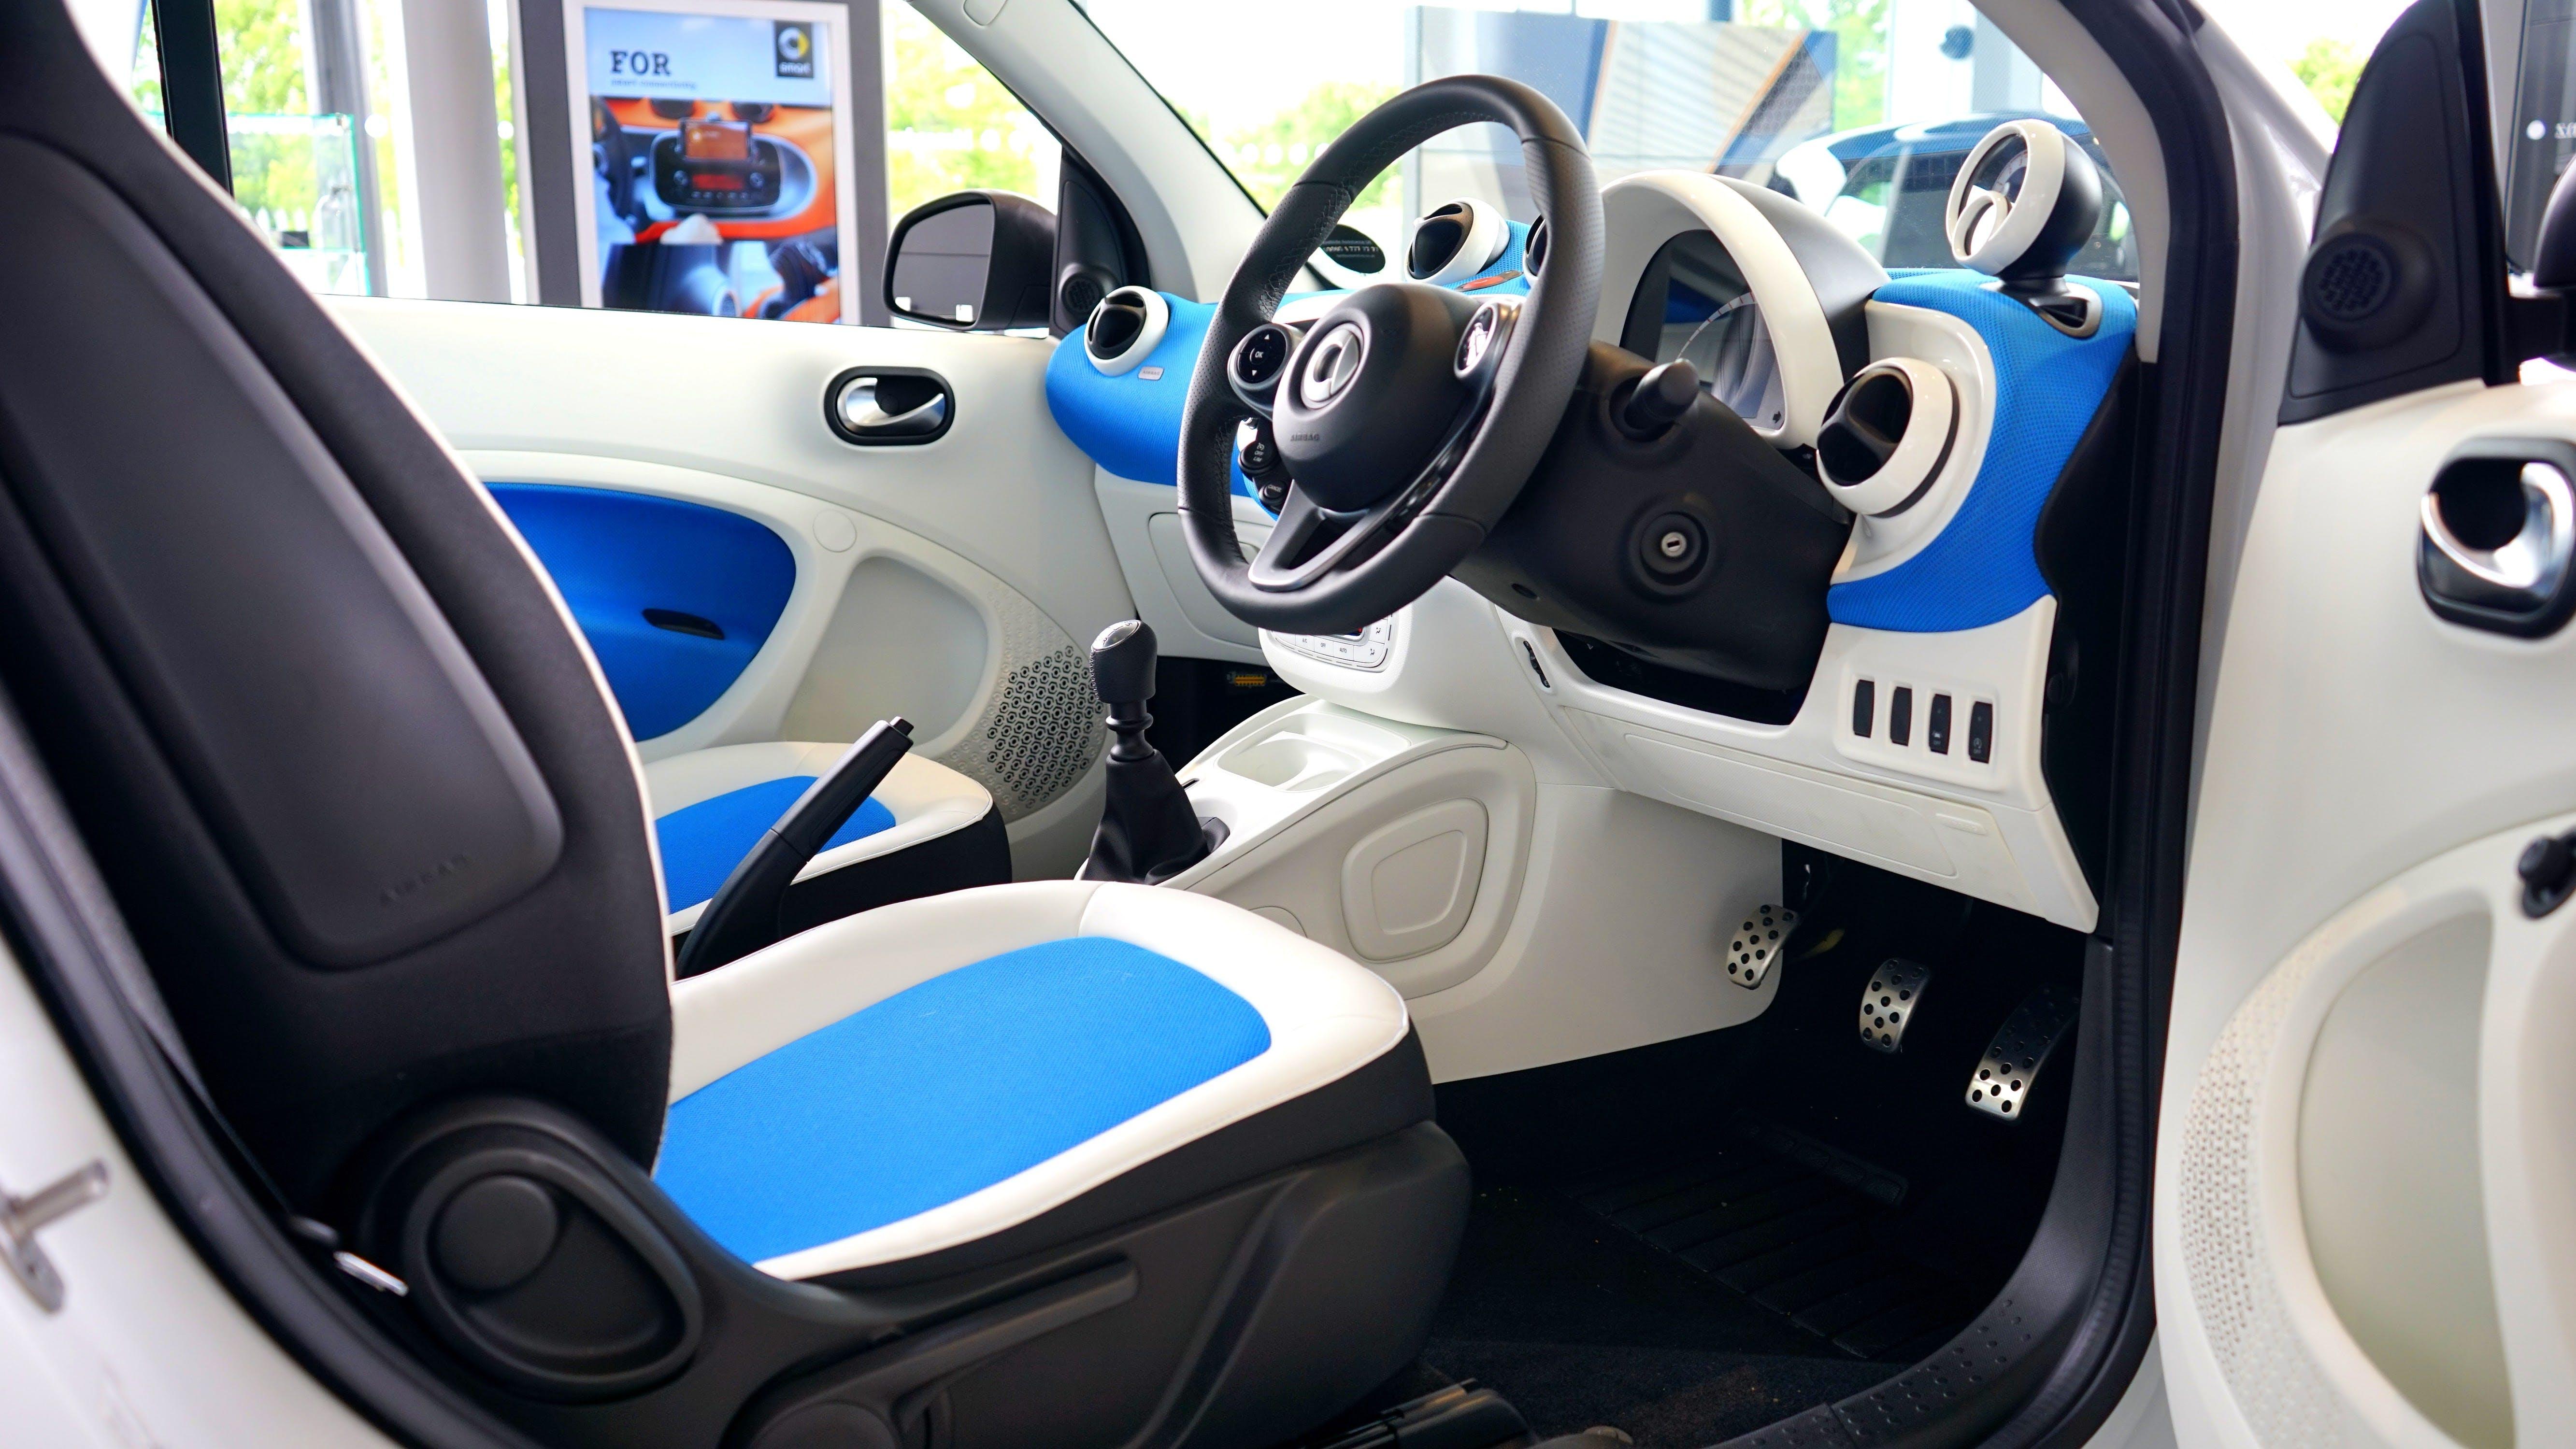 Black, White, and Blue Vehicle